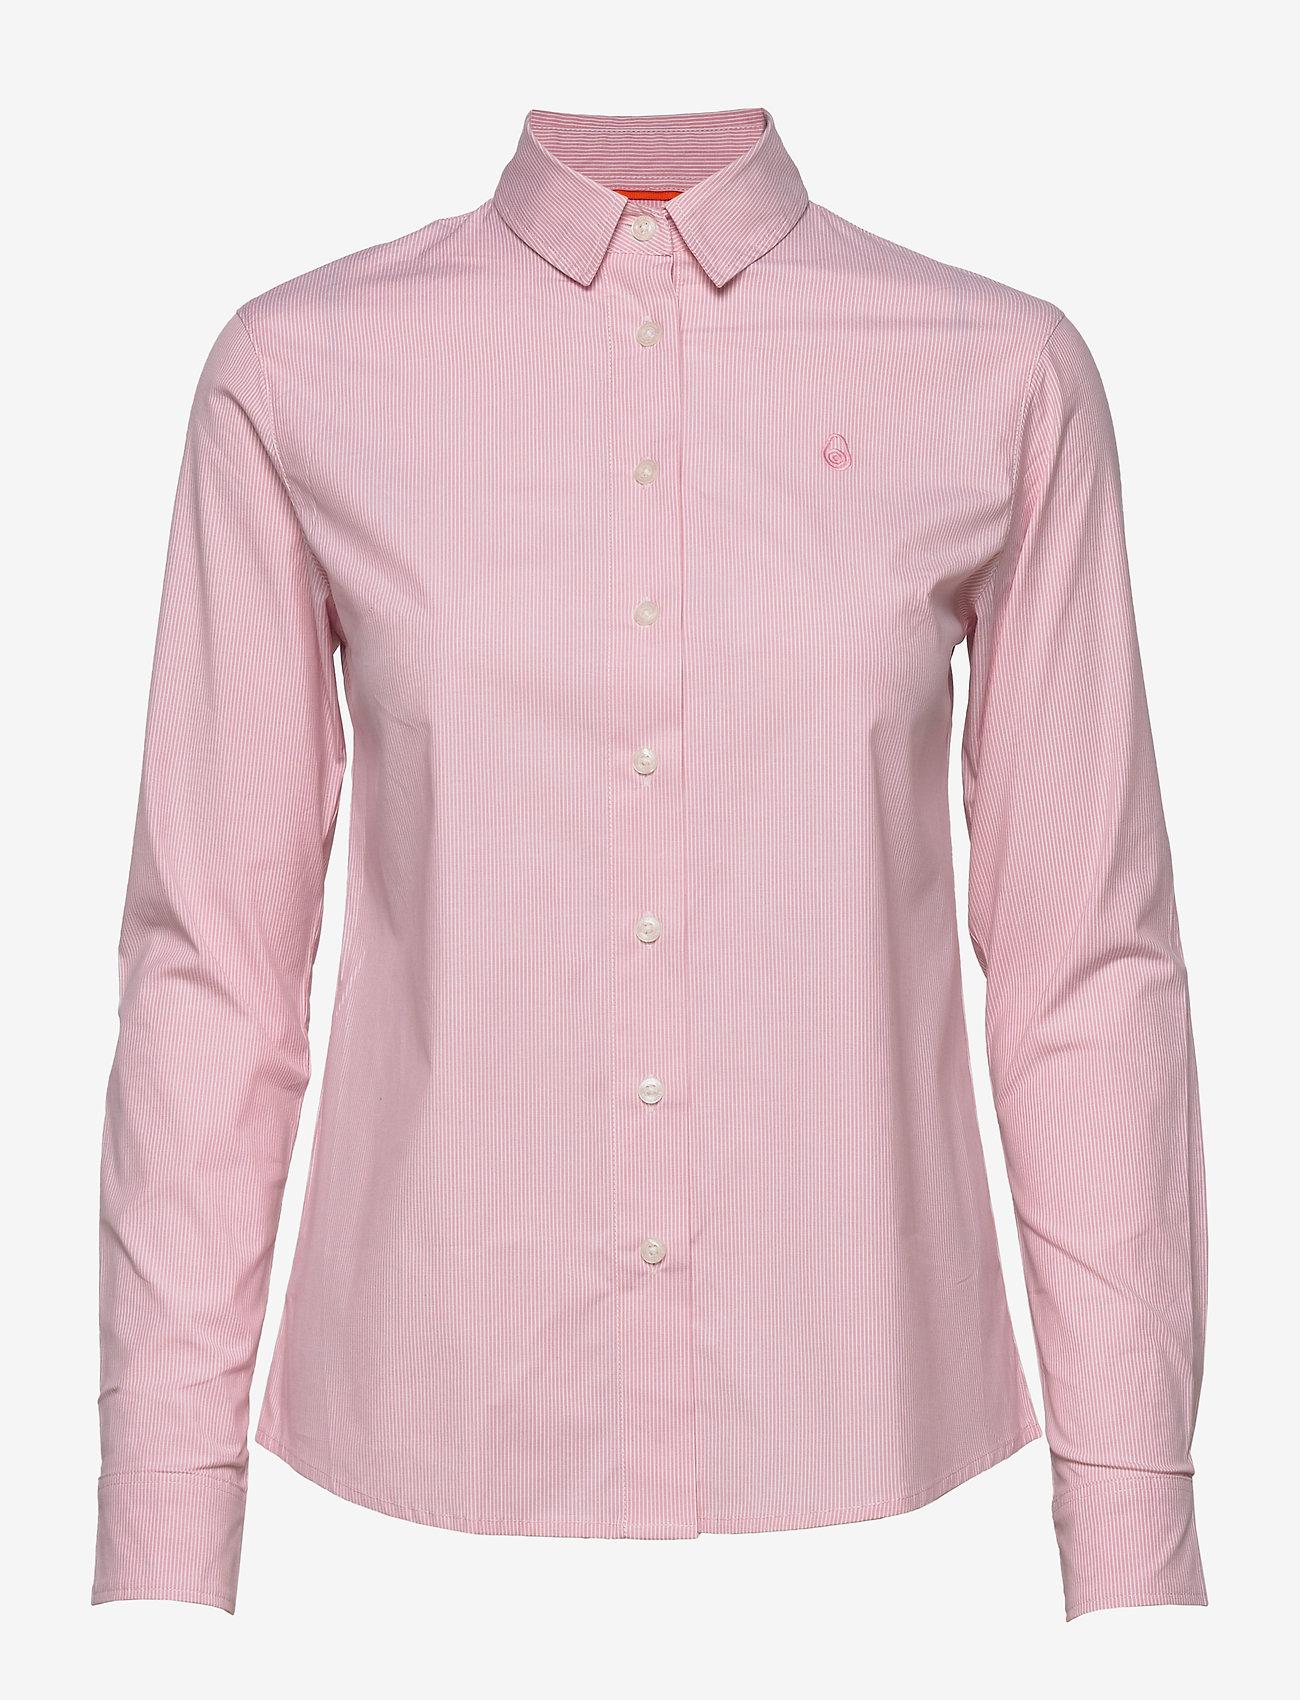 Sail Racing - W GALE STRIPED SHIRT - long-sleeved shirts - light pink - 0